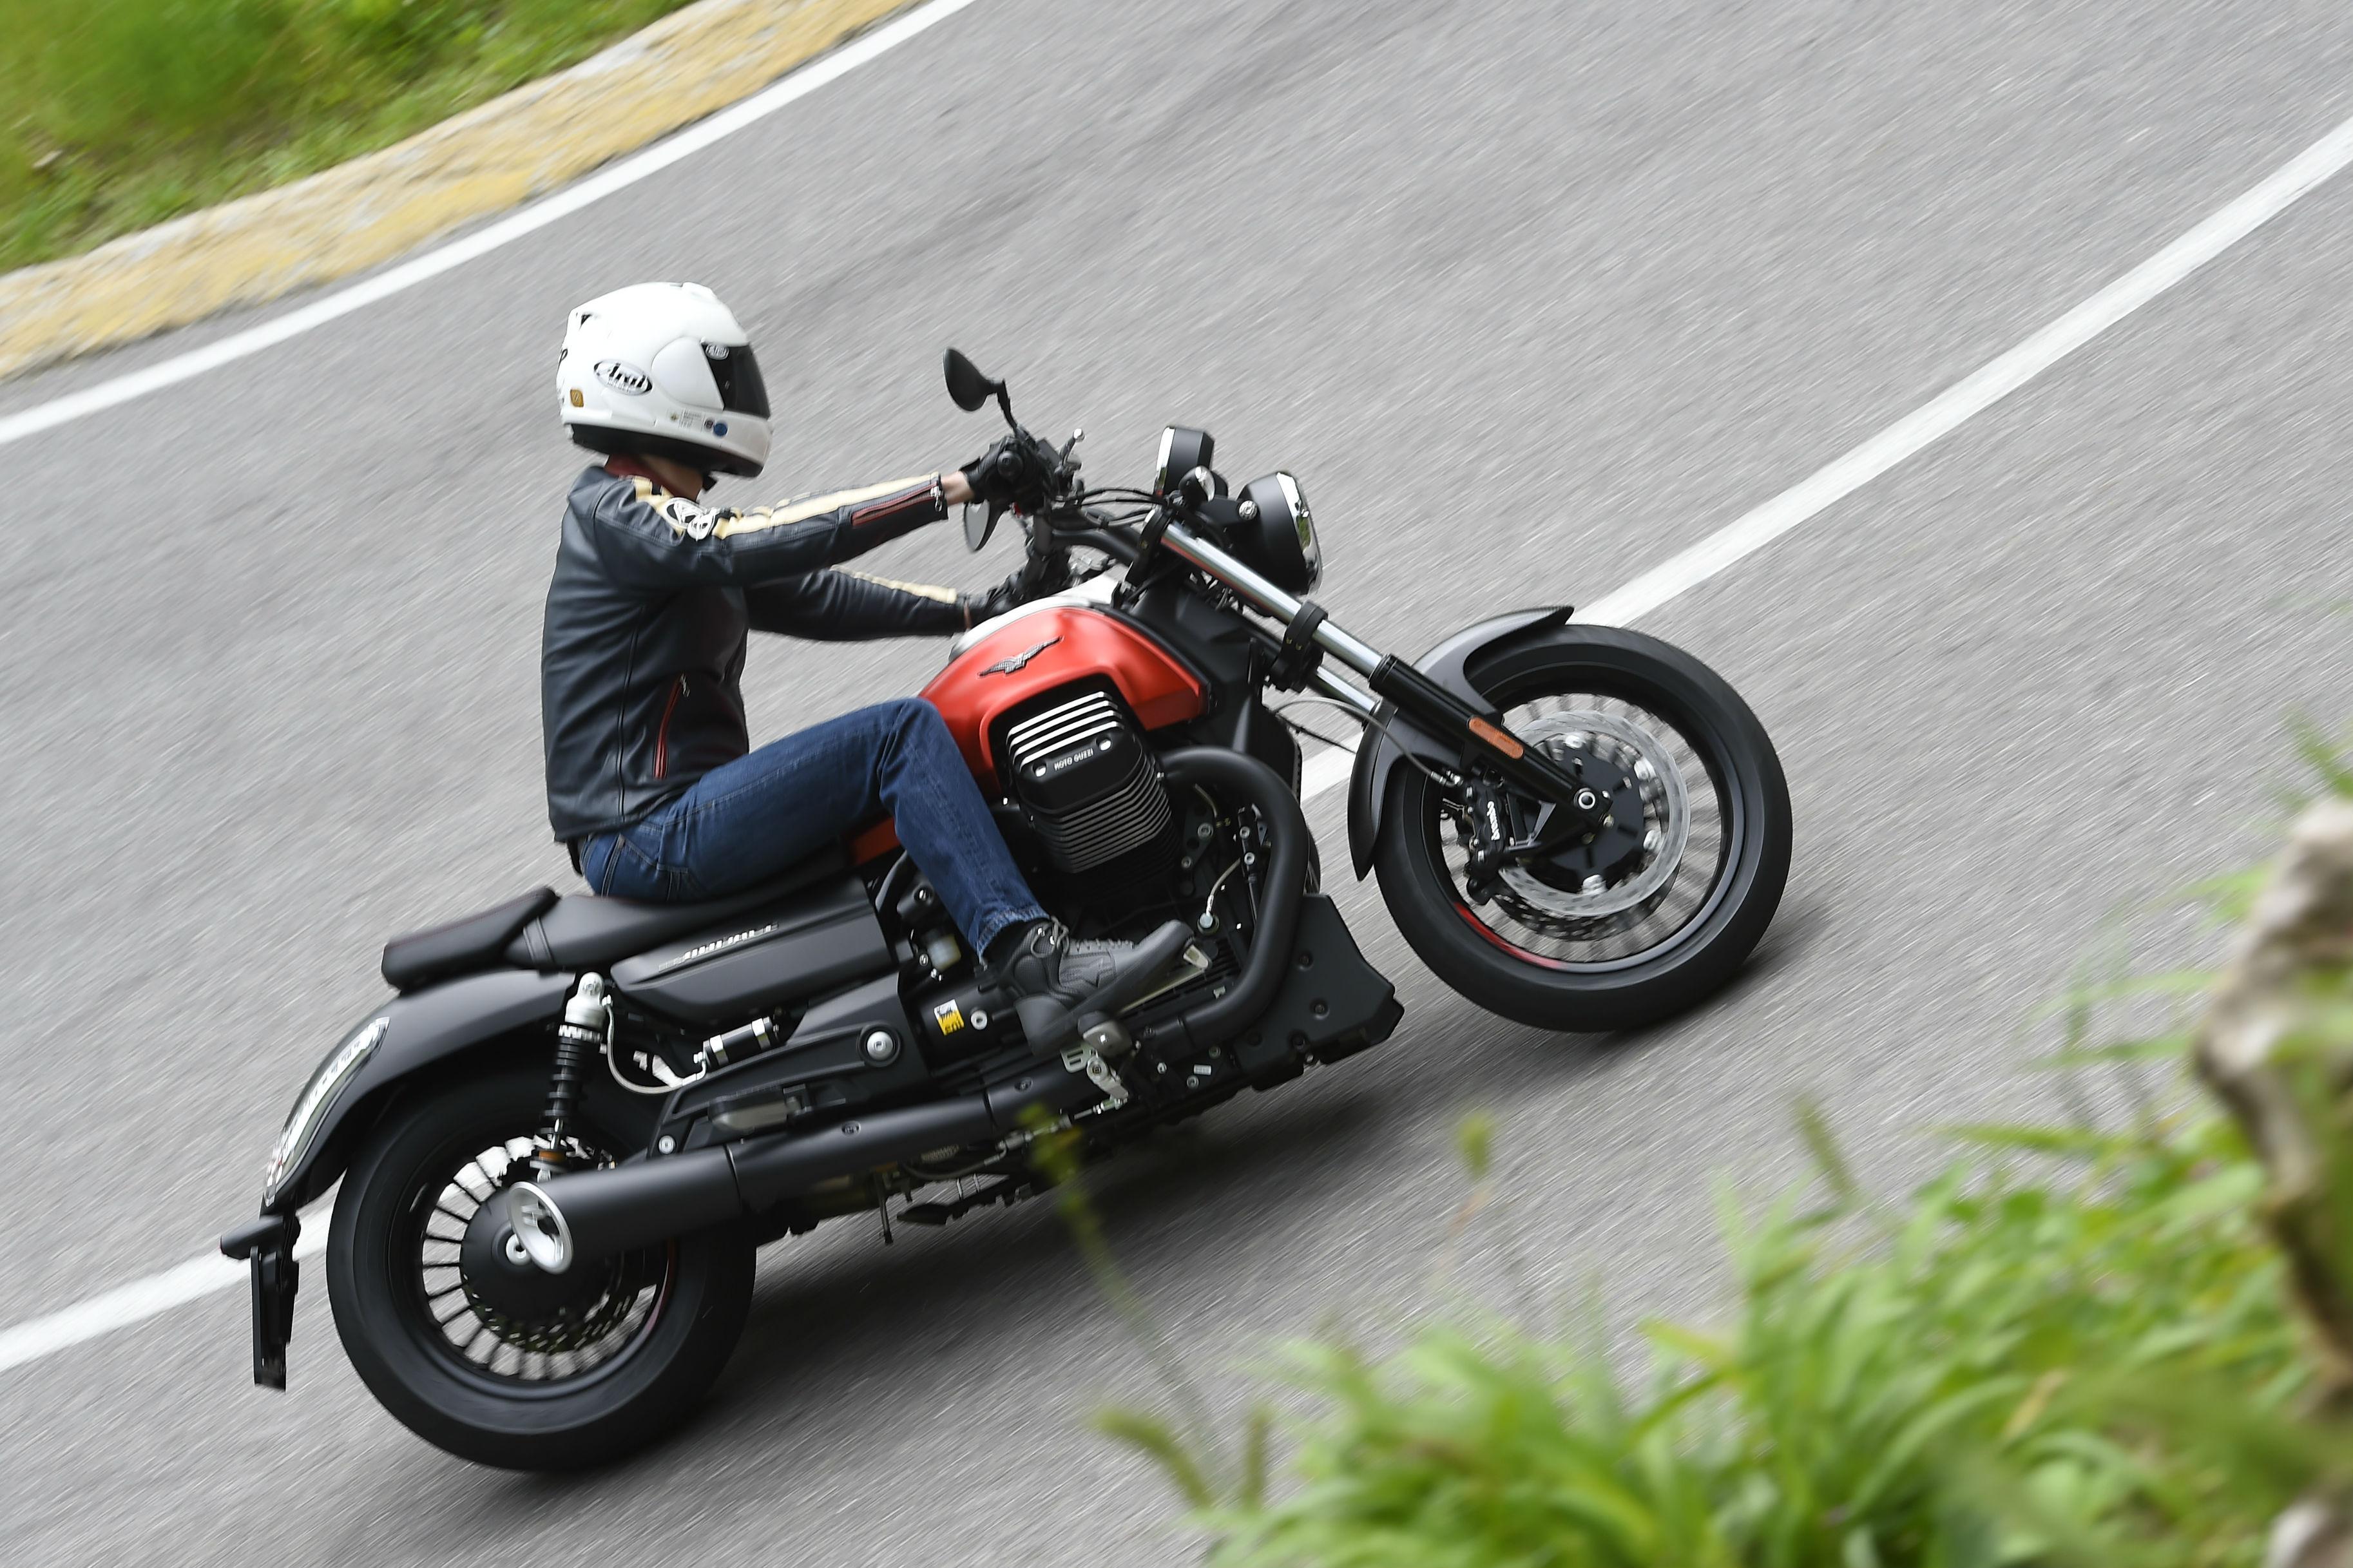 First ride: Moto Guzzi Audace review | Visordown